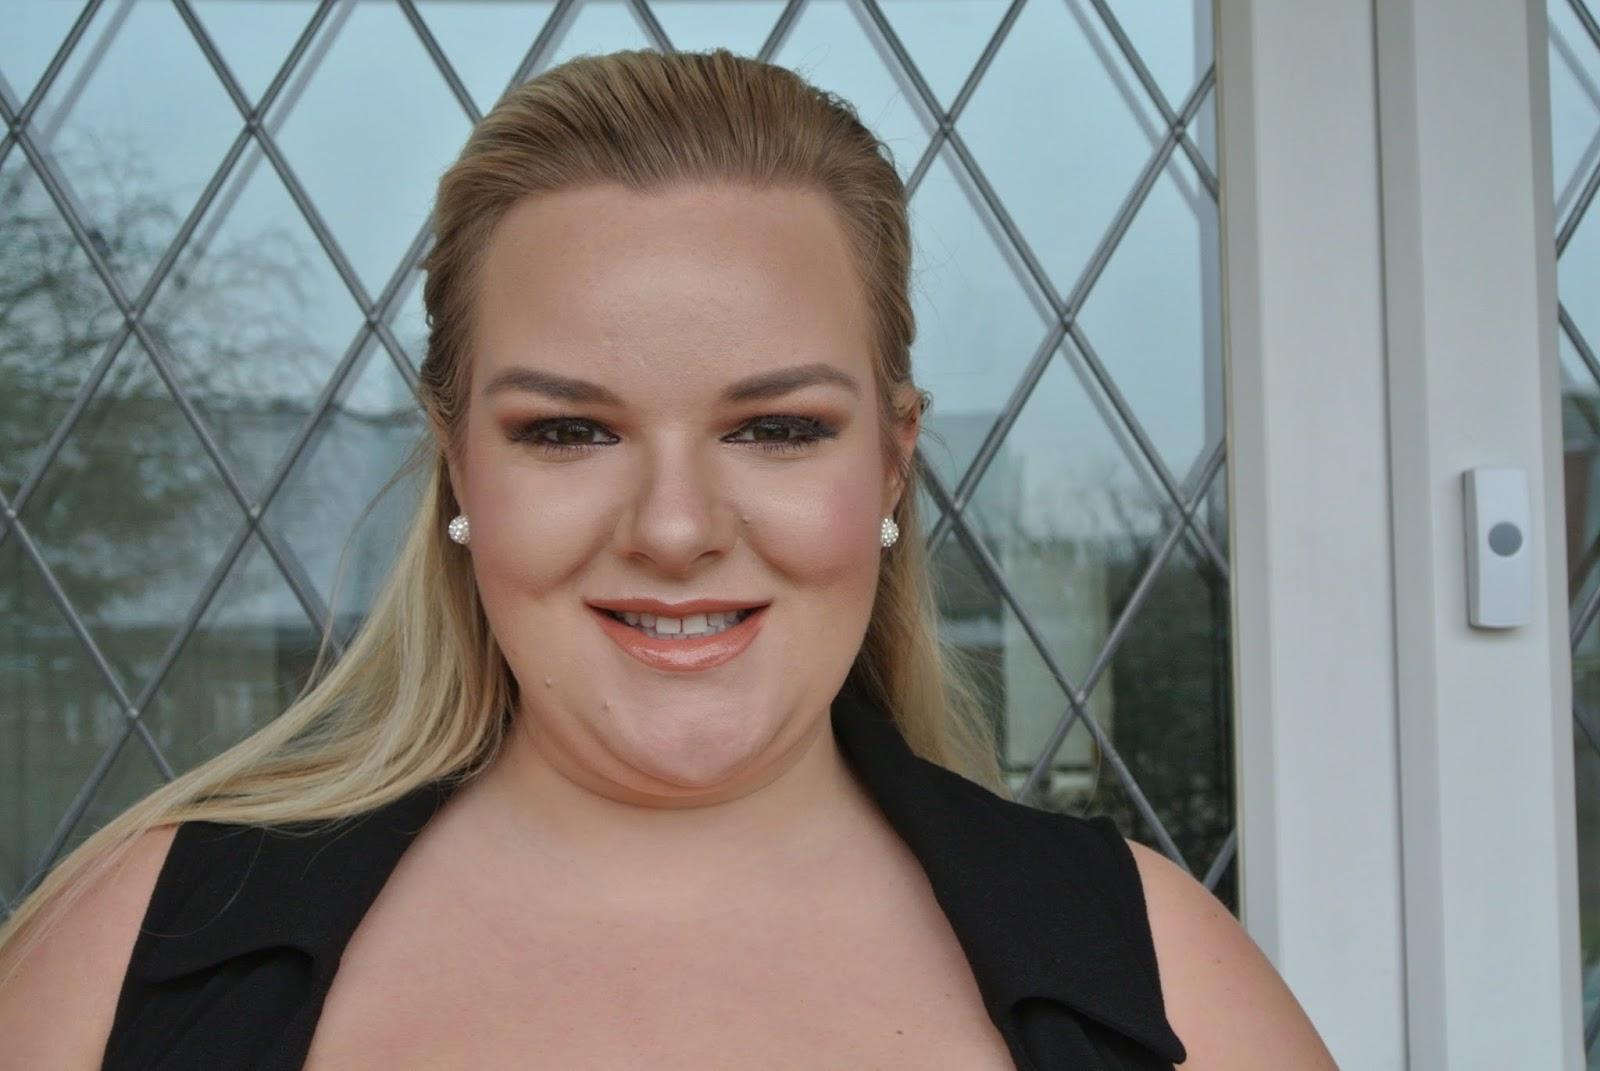 UK Plus Size Fashion Blogger WhatLauraLoves